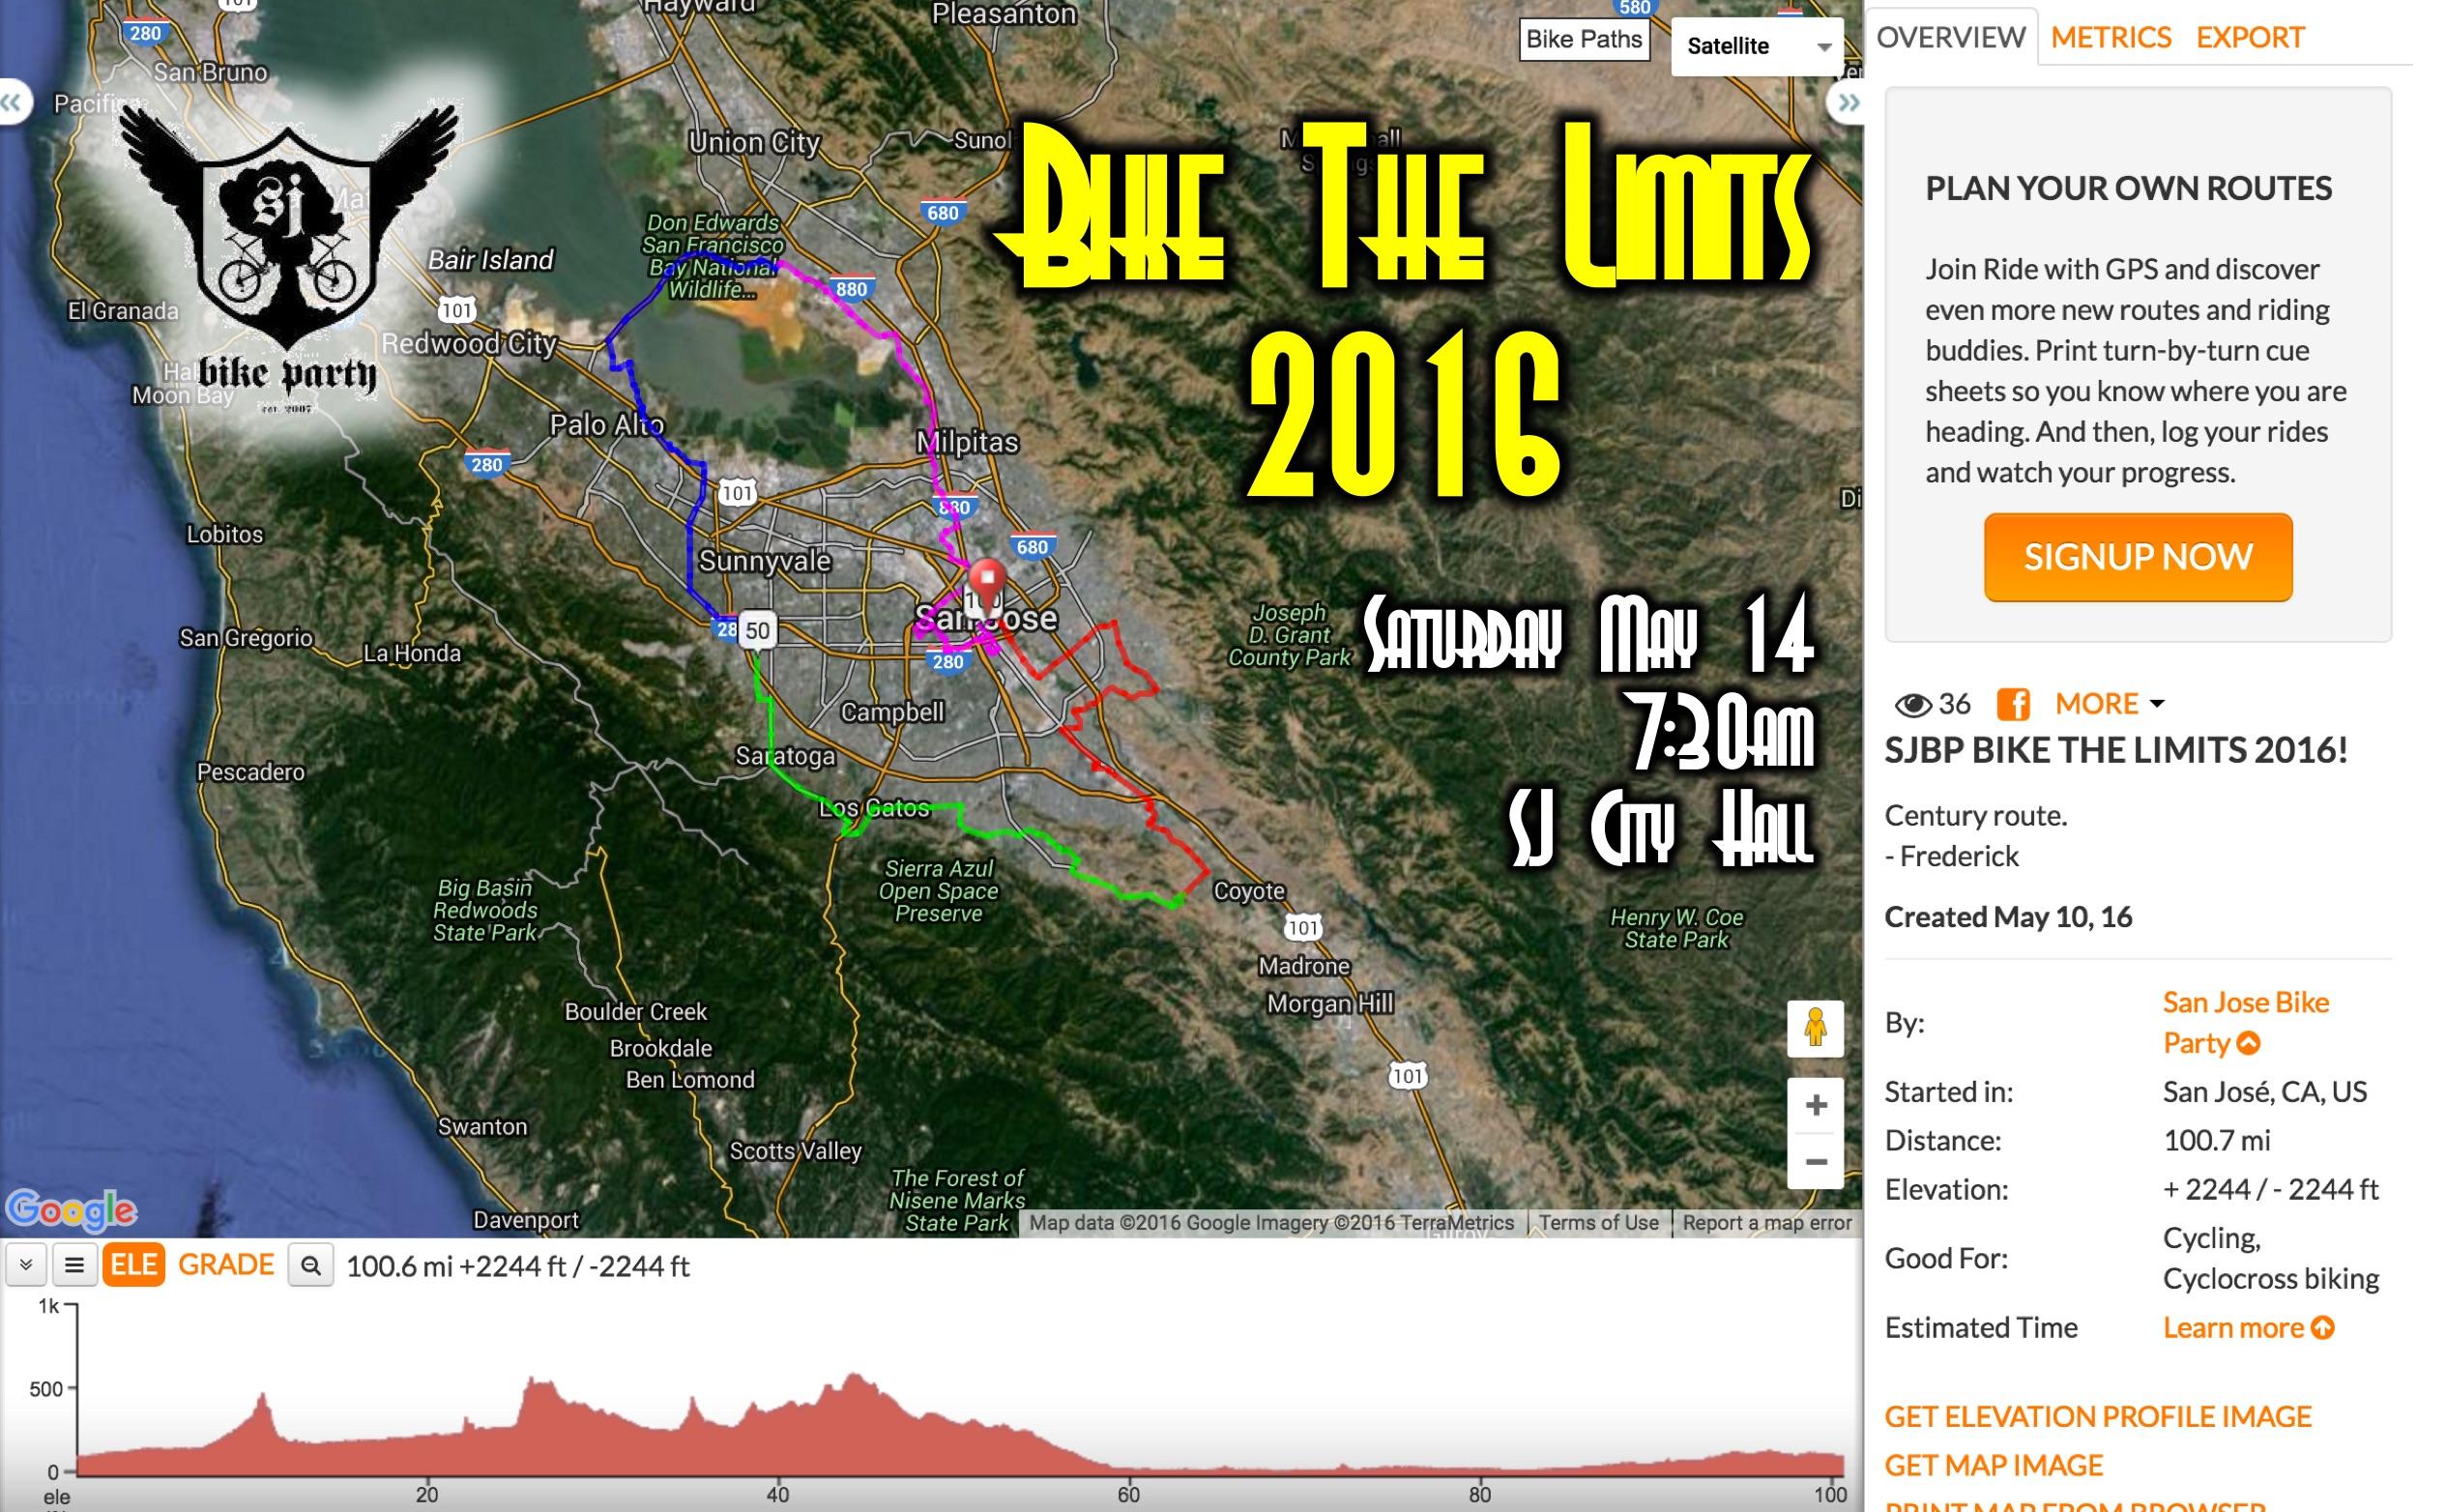 Bike The Limits 2016 – May 14, 2016